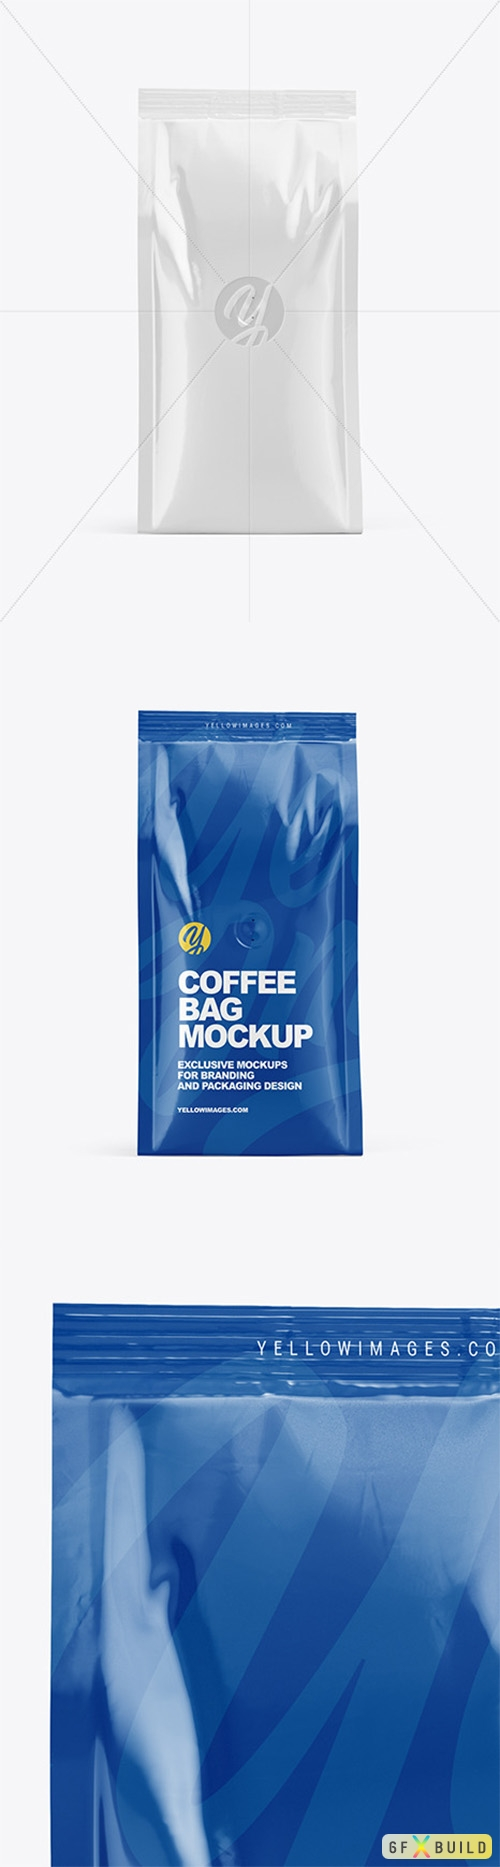 Glossy Coffee Bag Mockup - Front View 63255 TIF